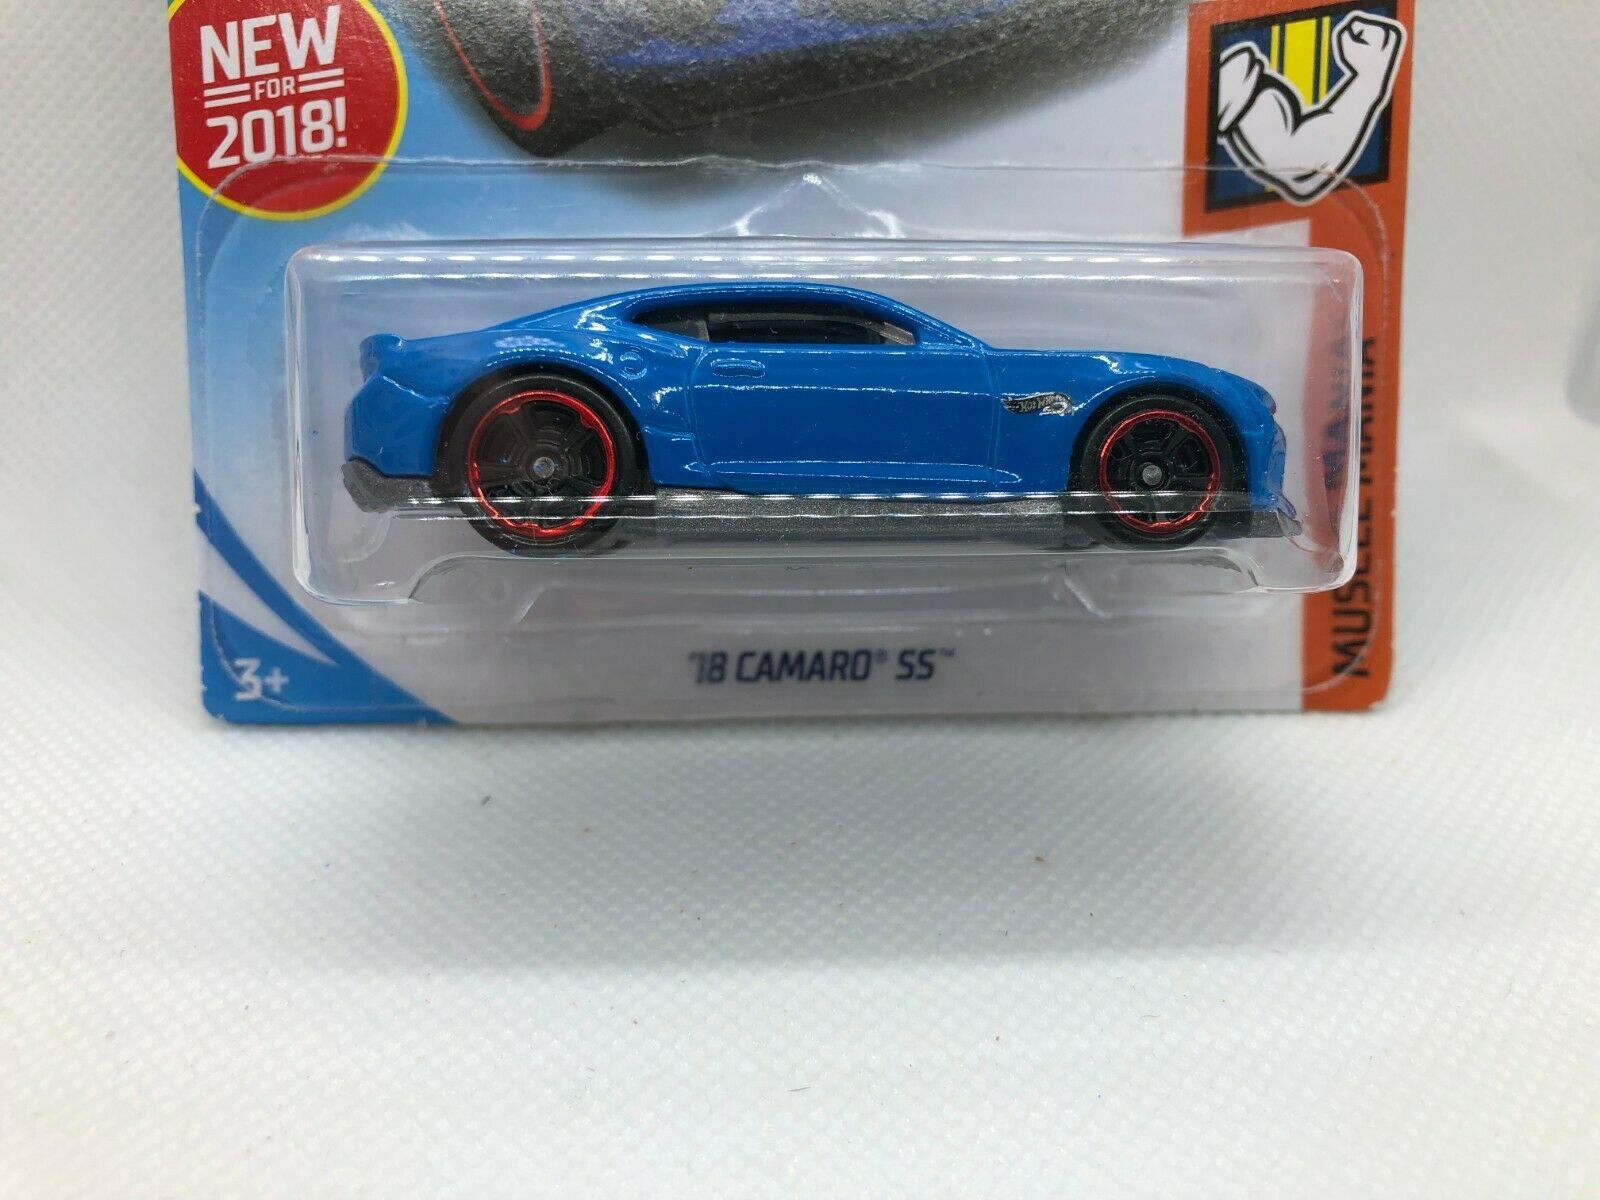 18 Camaro SS